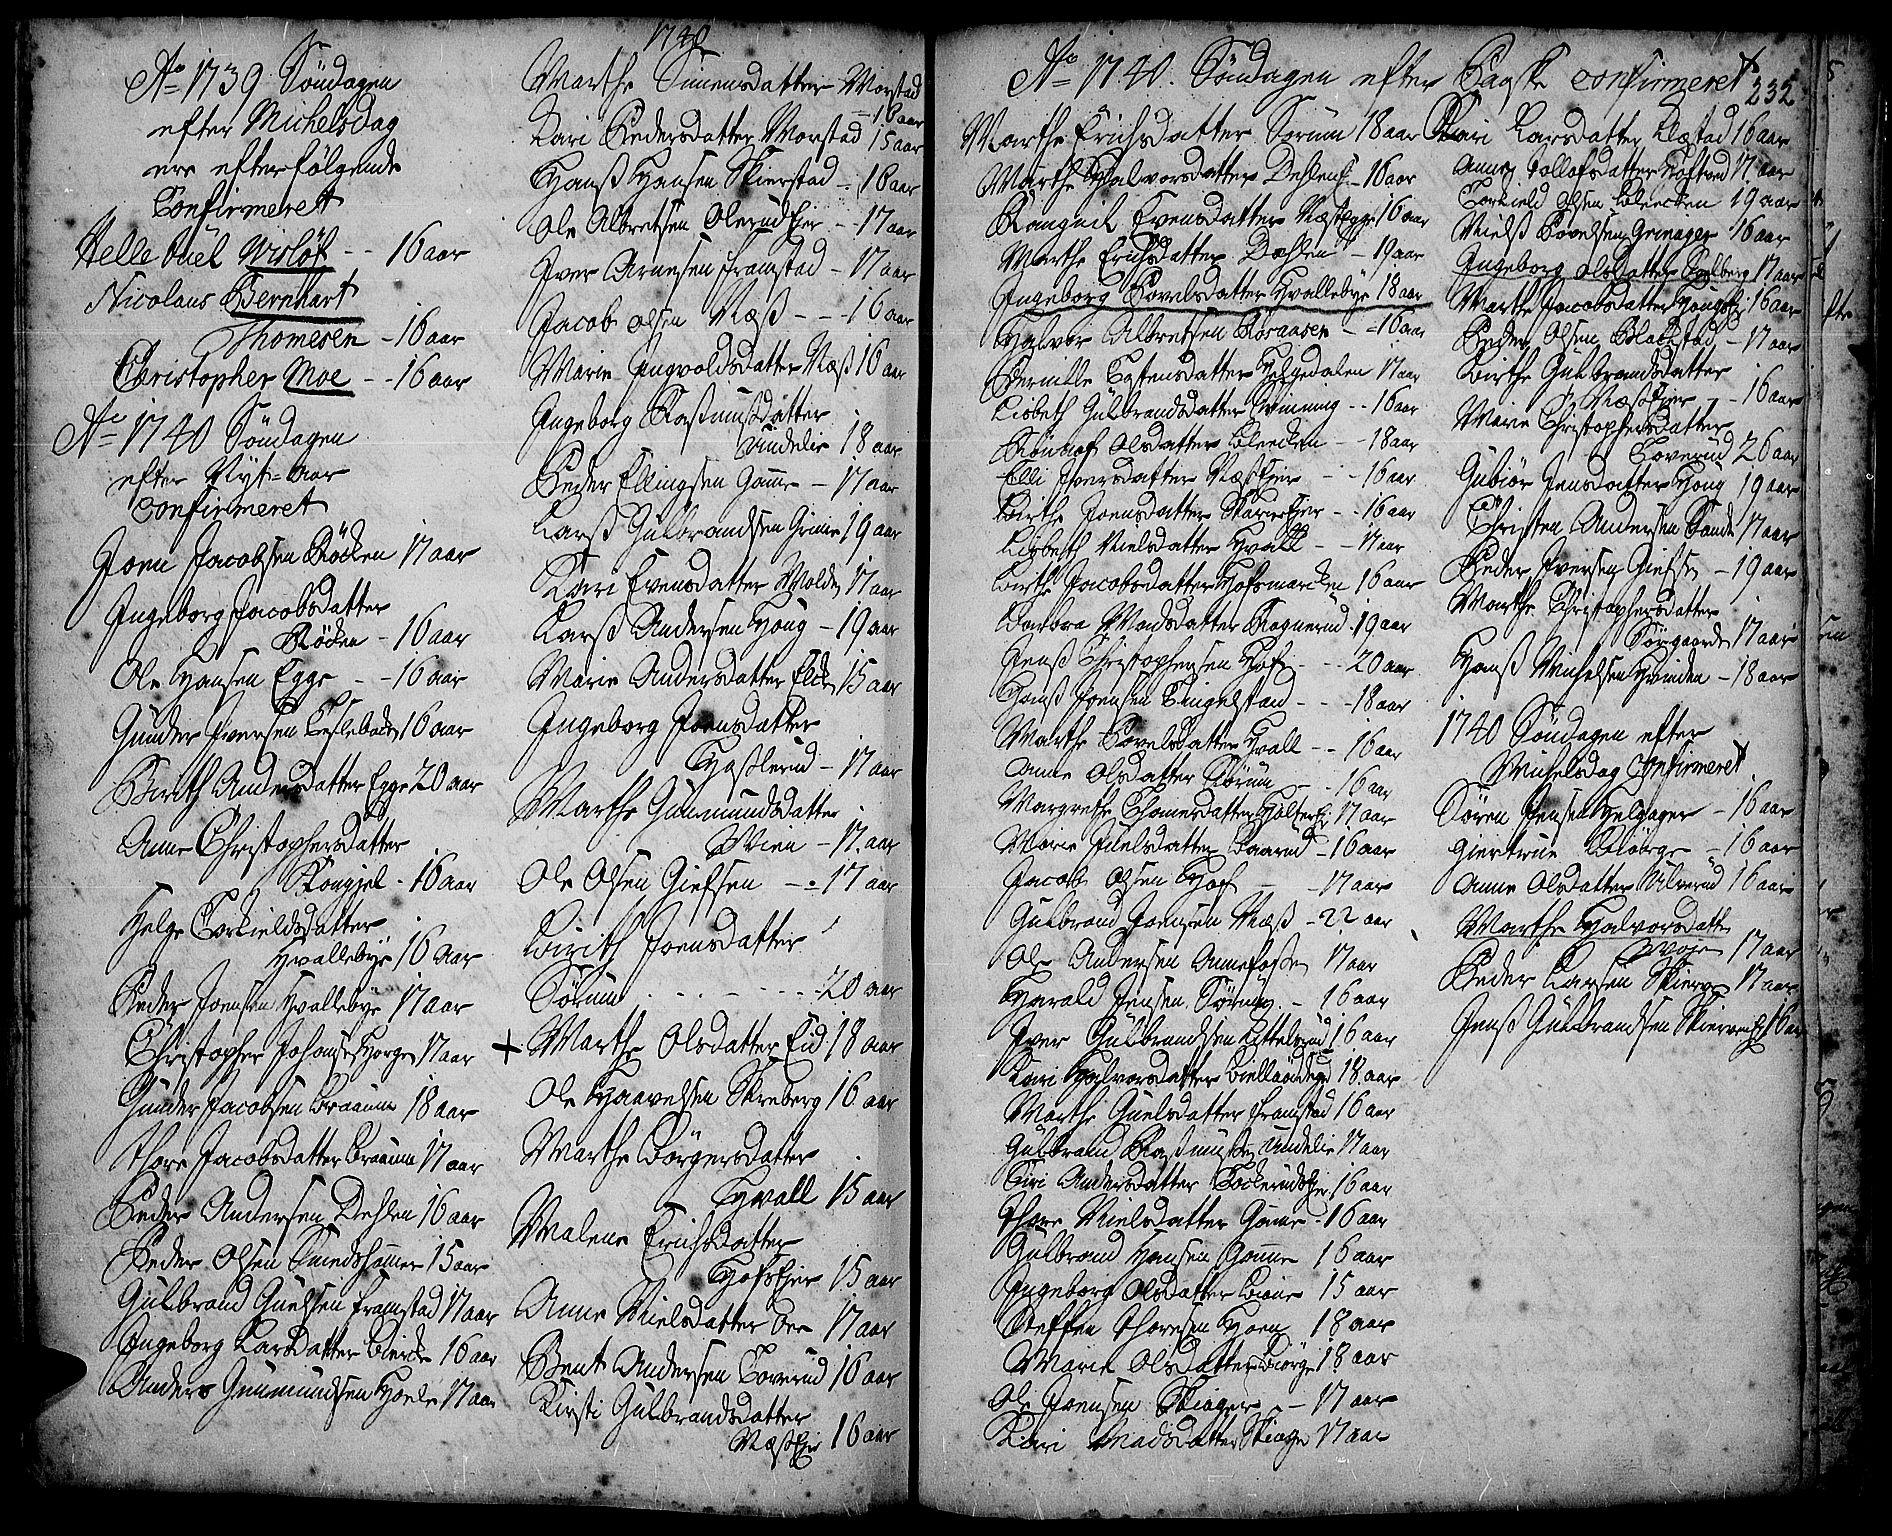 SAH, Gran prestekontor, Ministerialbok nr. 2, 1732-1744, s. 232